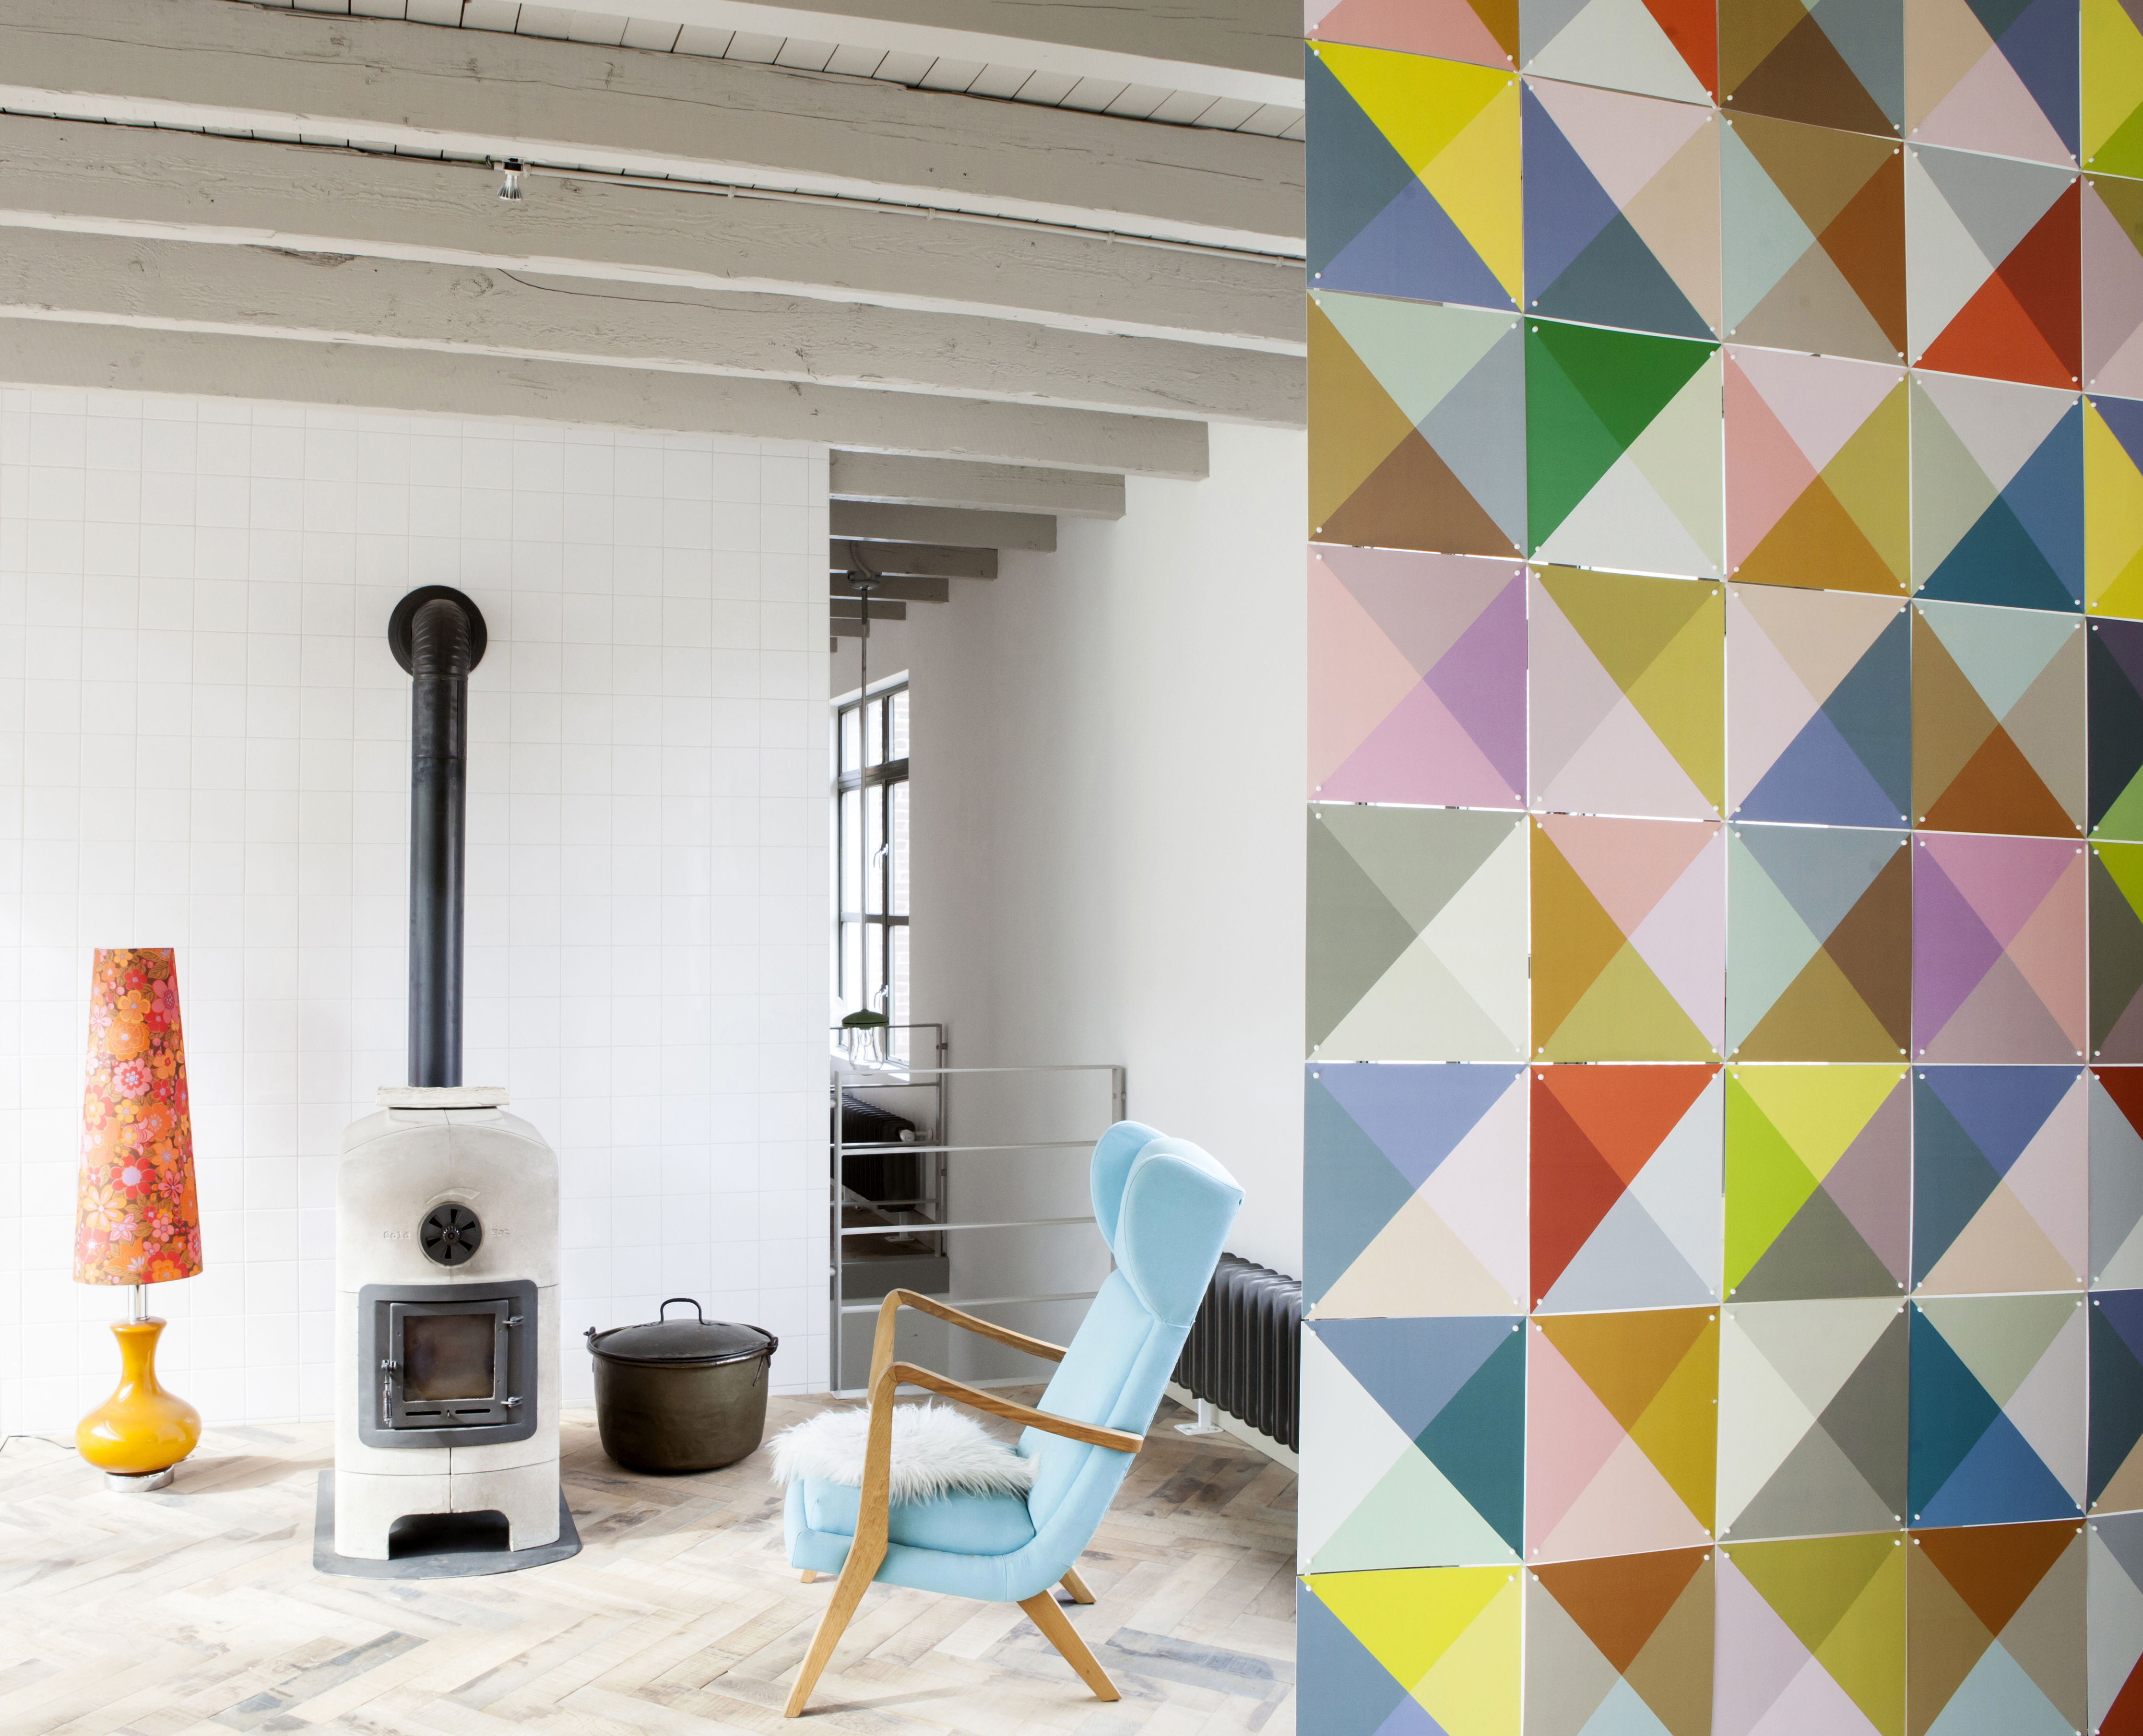 panneau d coratif loco 2 m multicolore ixxi. Black Bedroom Furniture Sets. Home Design Ideas